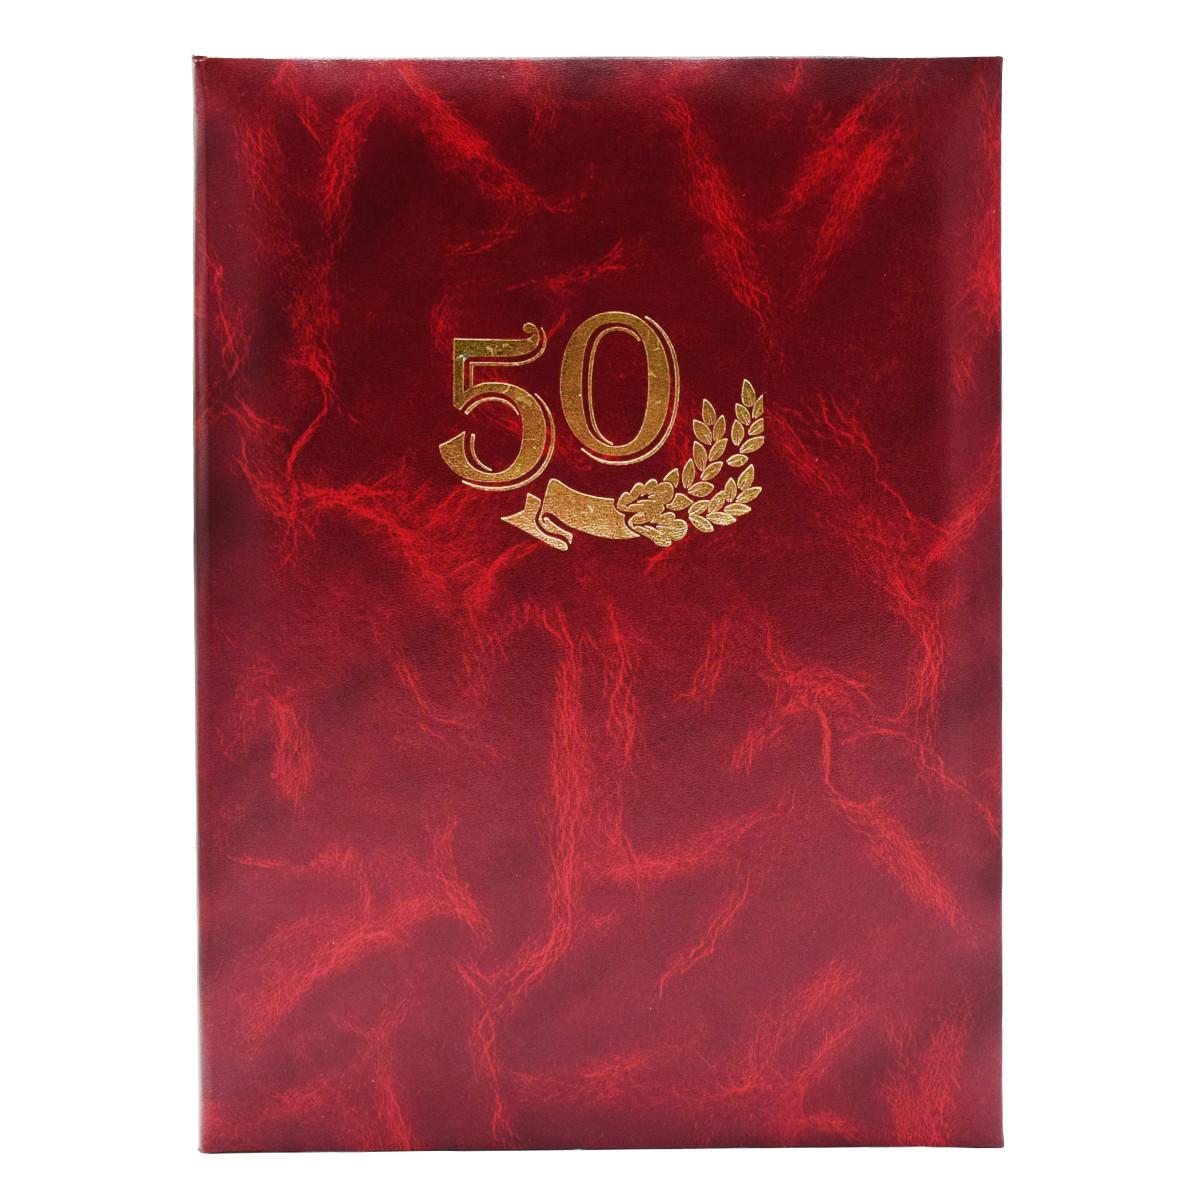 Адресна папка ВОД, 50 років